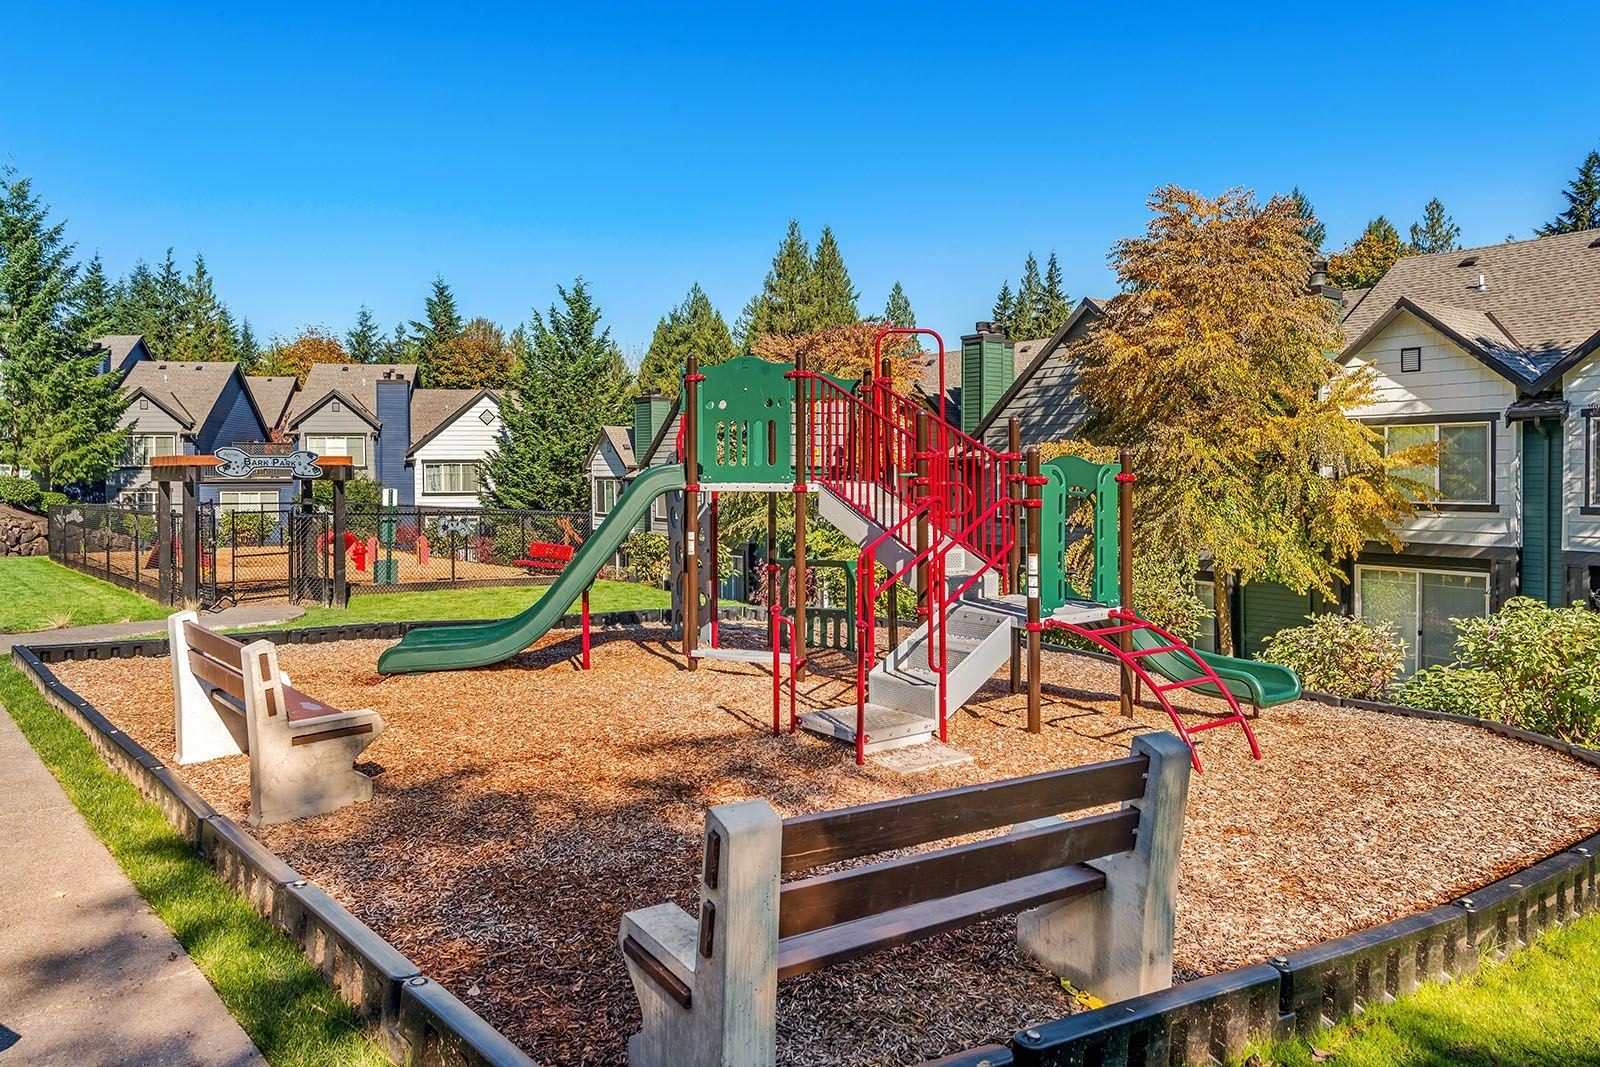 f825065f51c7b25ccee1931b78c9ae01 - Rock Creek Gardens Condos For Rent